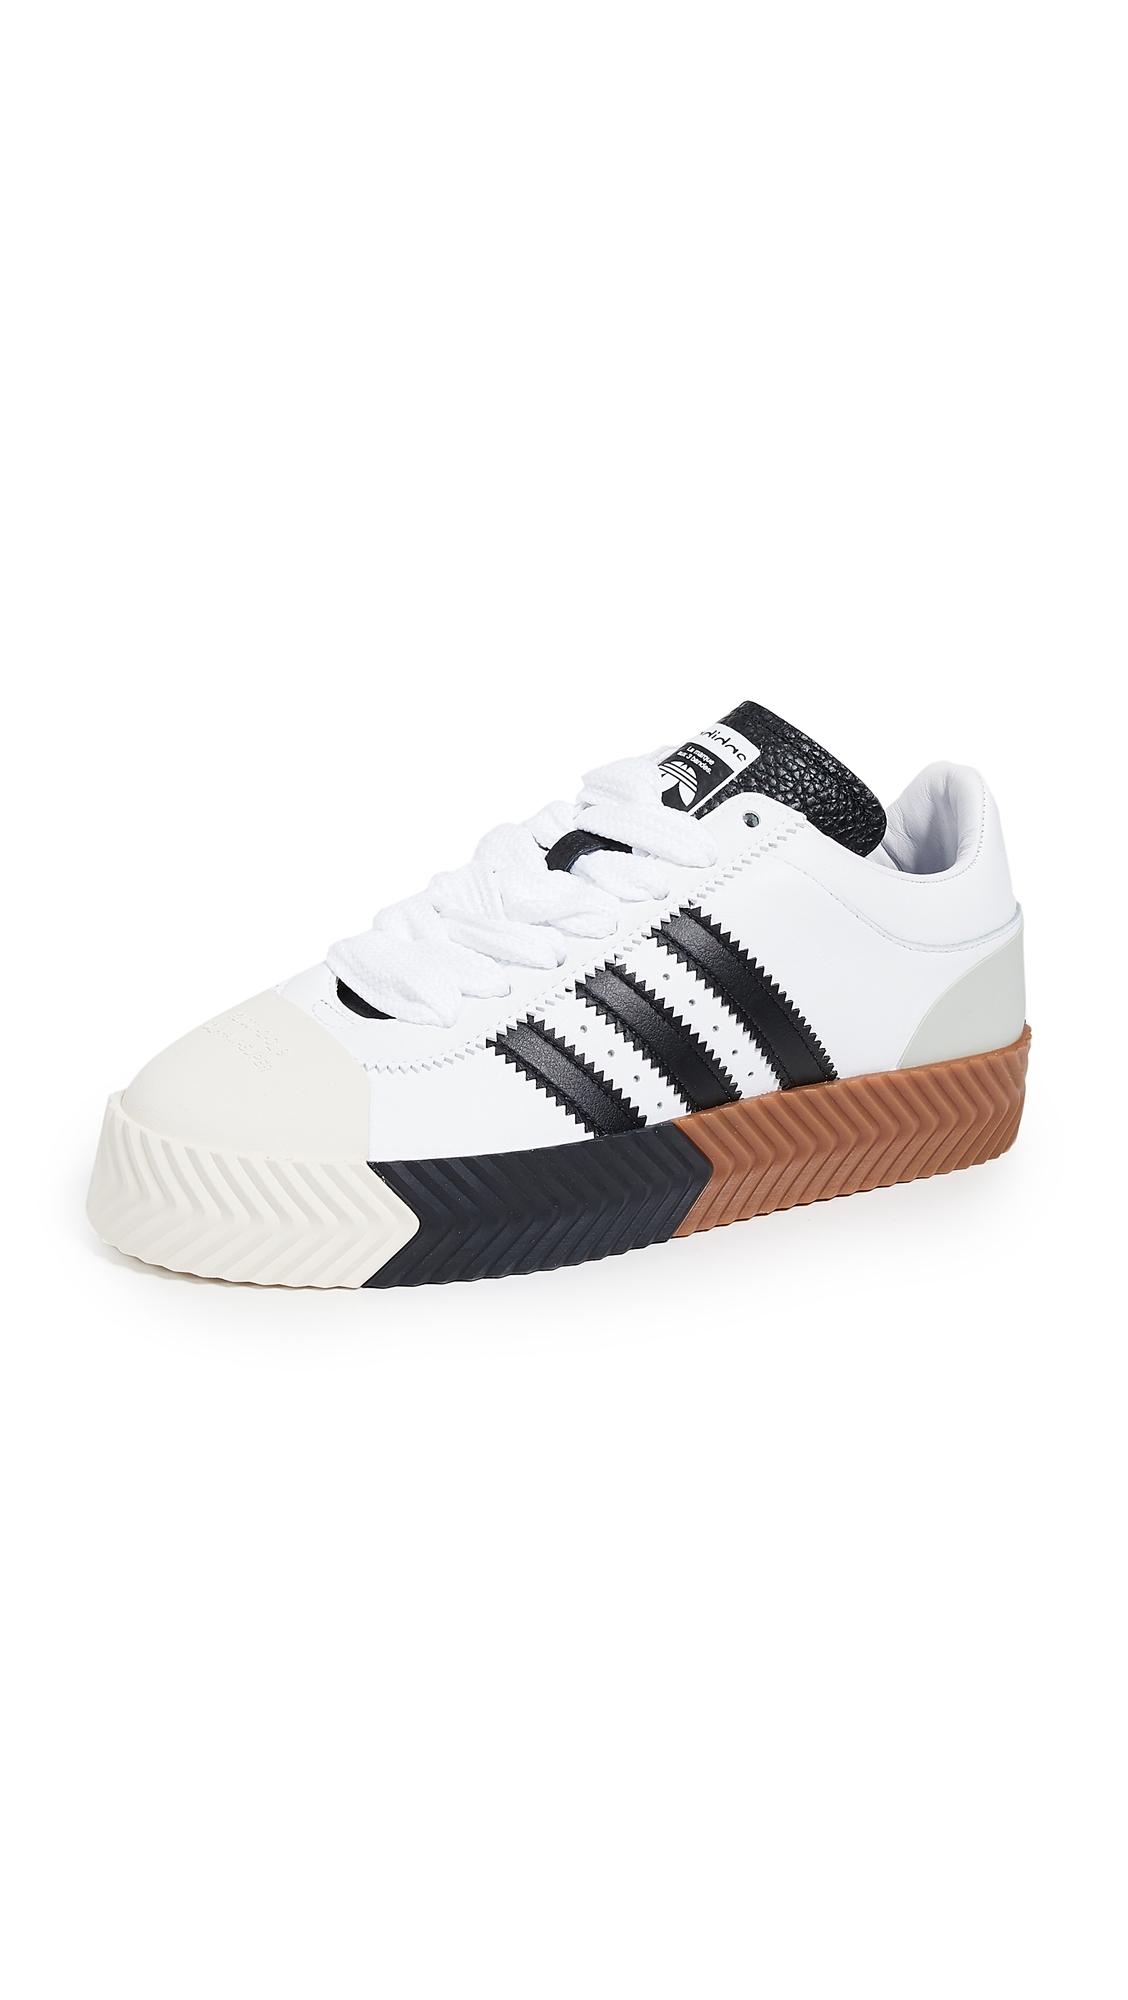 Adidas Originals By Alexander Wang AW SKATE SUPER SNEAKERS